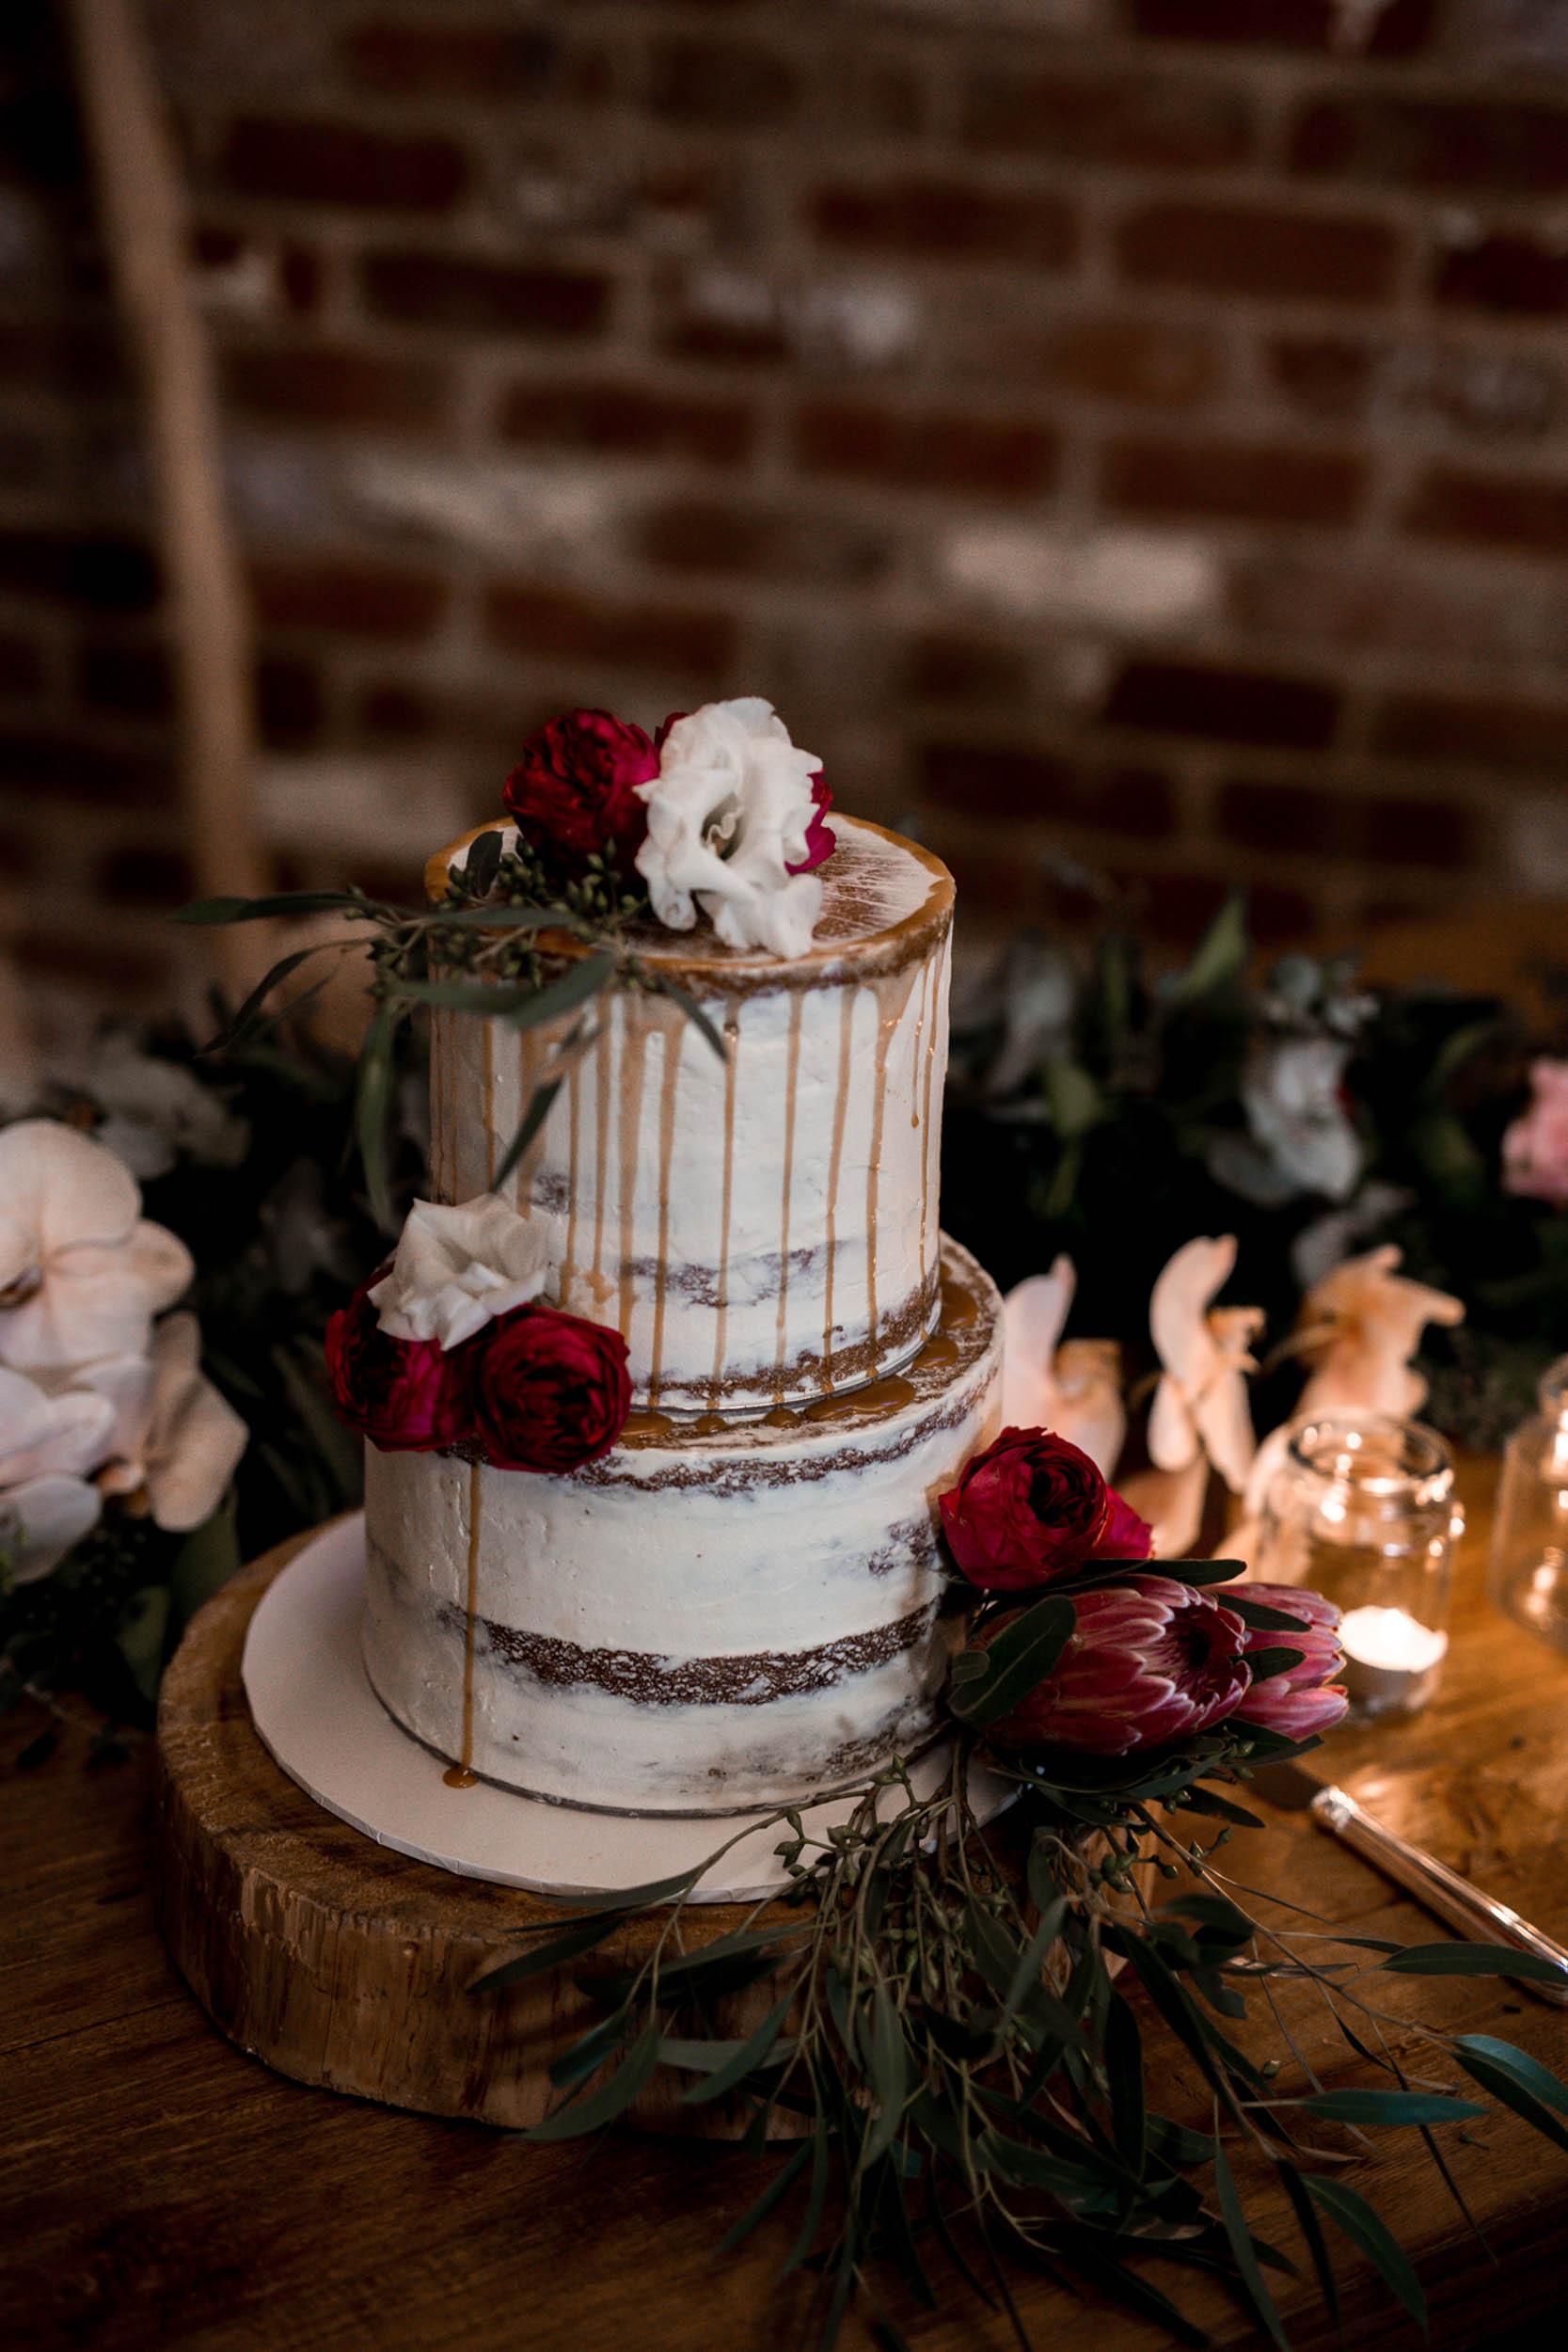 THE Cake - BAKER - Sweets For Tilly